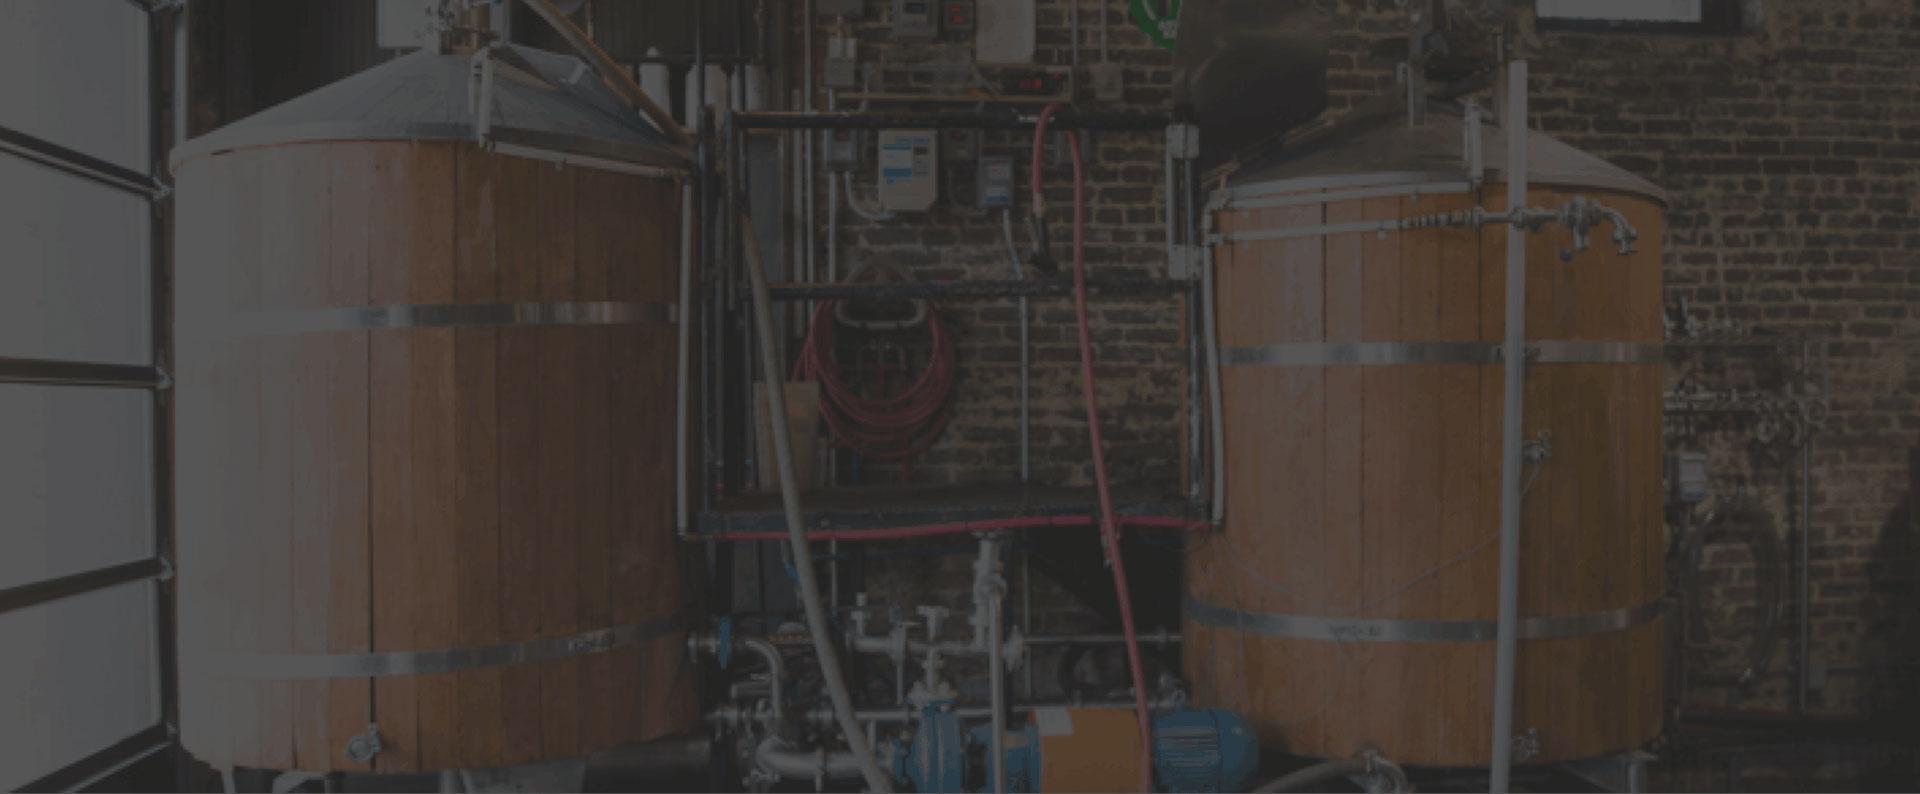 Identity creation for Birmingham brewery